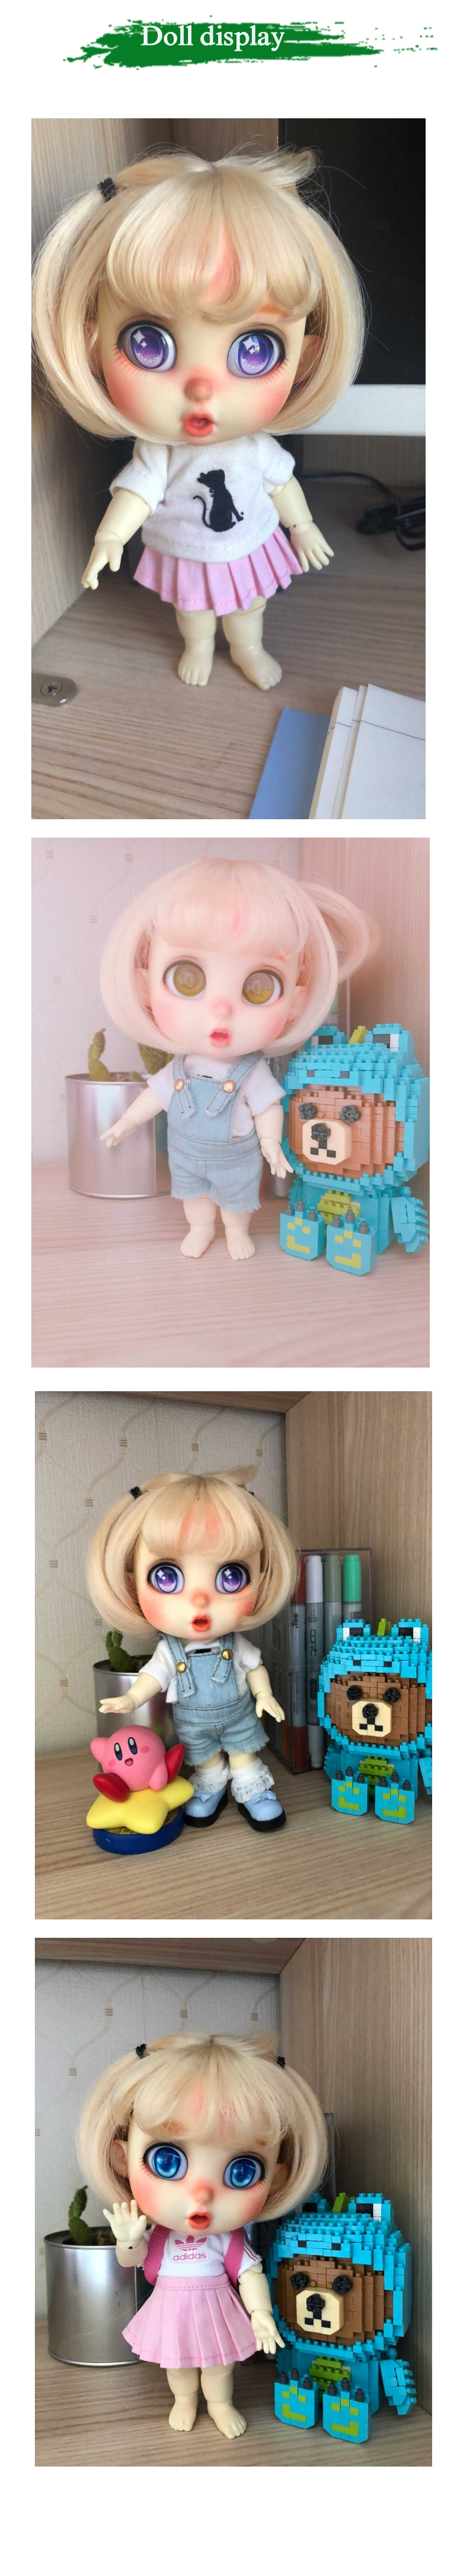 para menina menino nu boneca alta qualidade